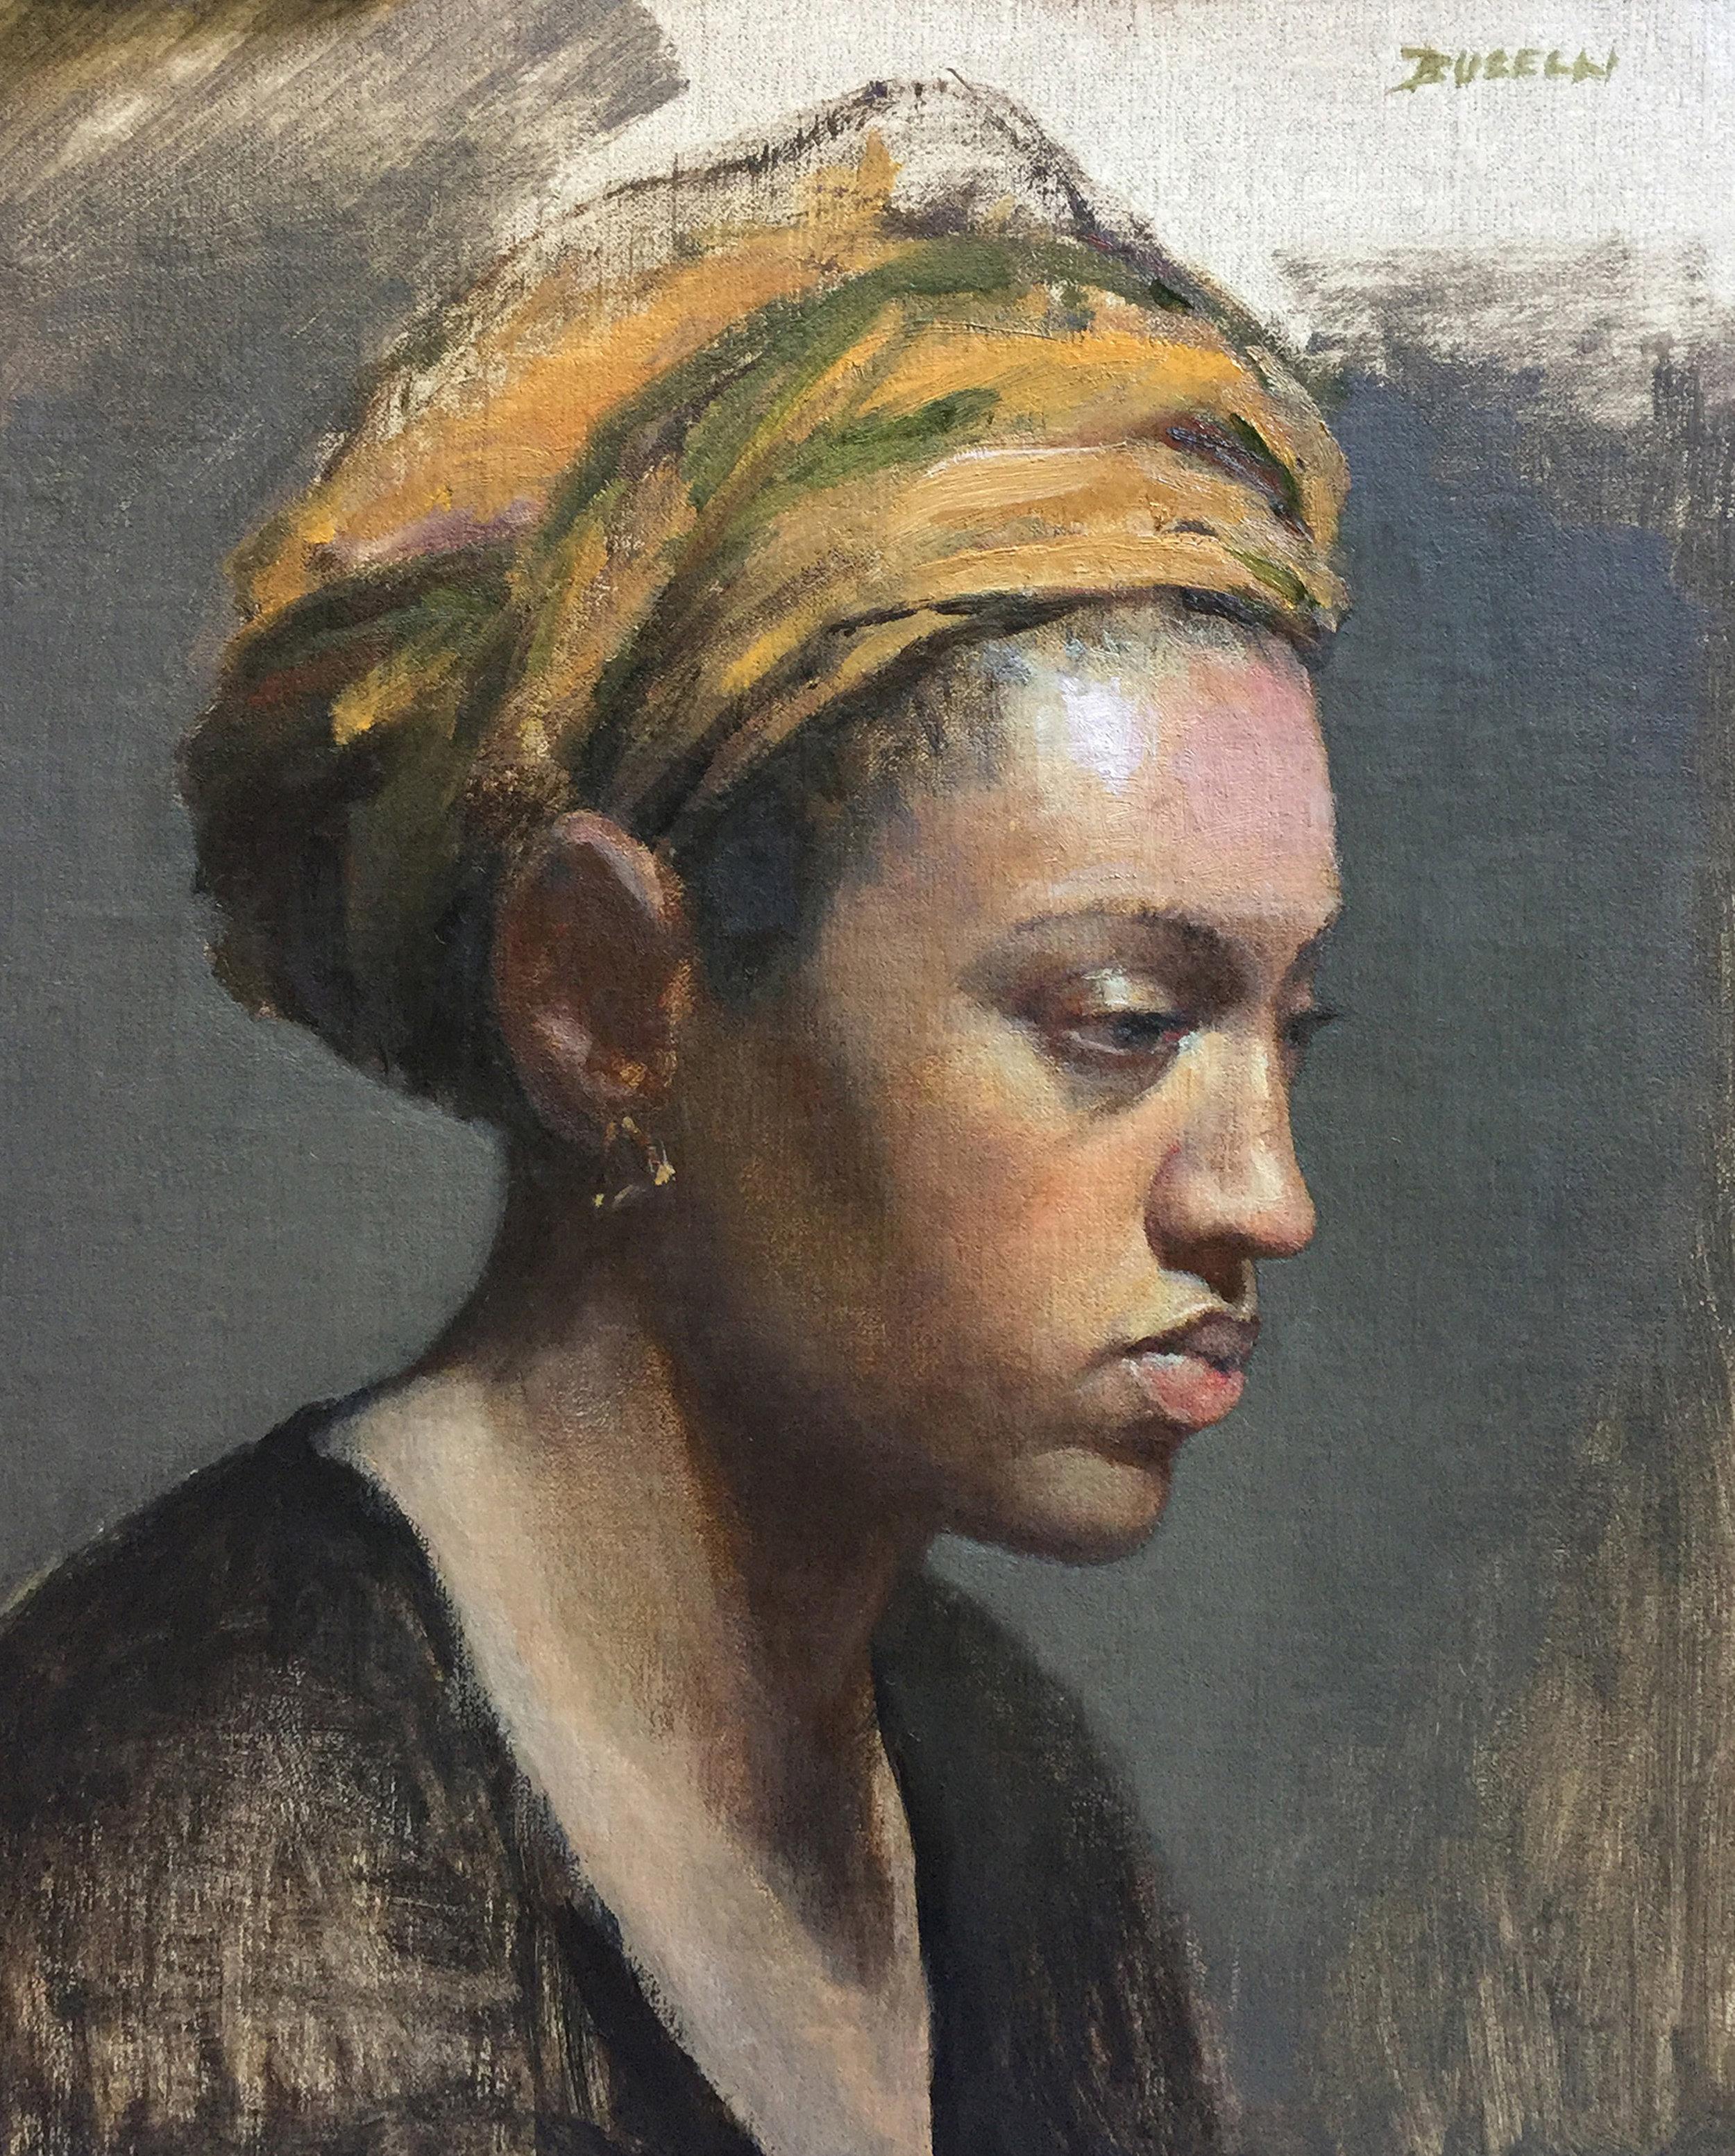 """WOMAN IN TURBAN""  oil on linen | 12"" x 10"""